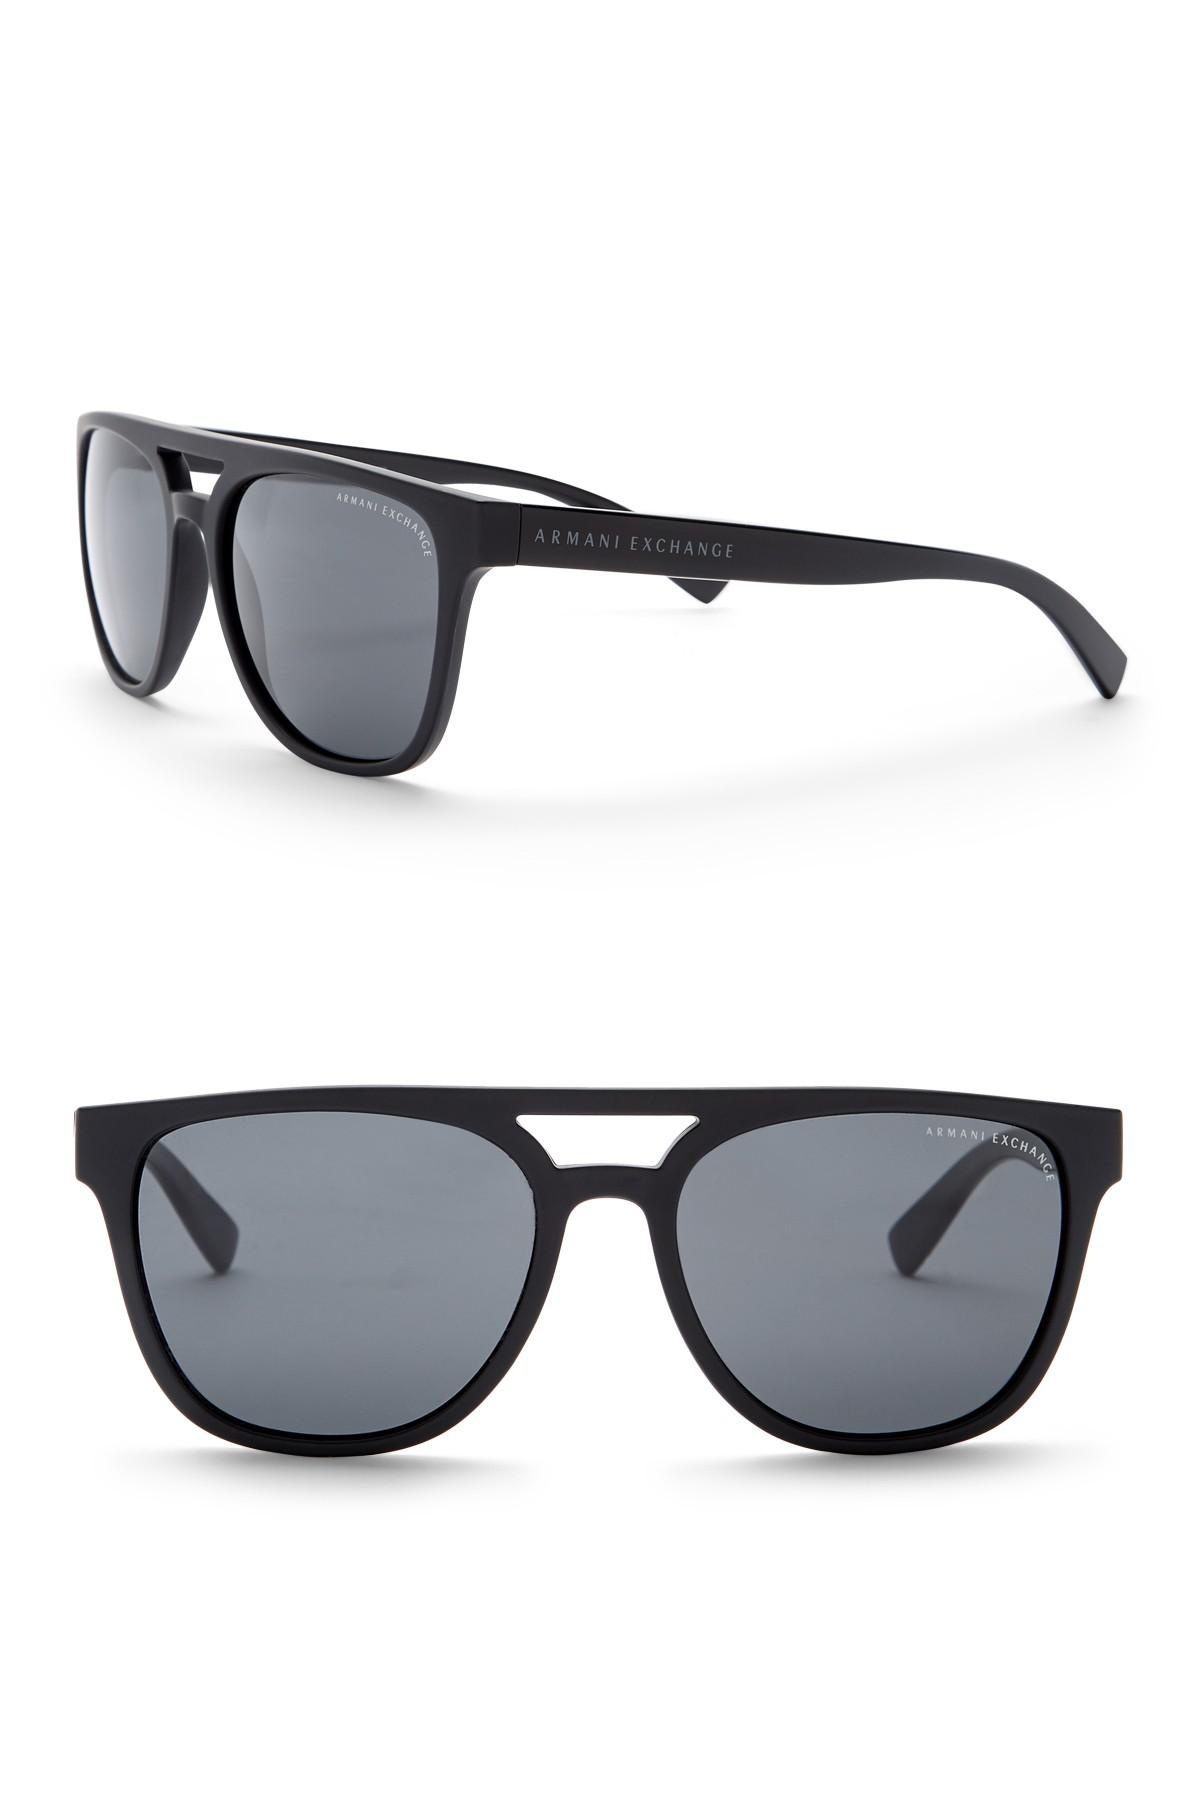 a845f7bf228c Lyst - Armani Exchange Men s Brow Bar 55mm Acetate Frame Sunglasses ...